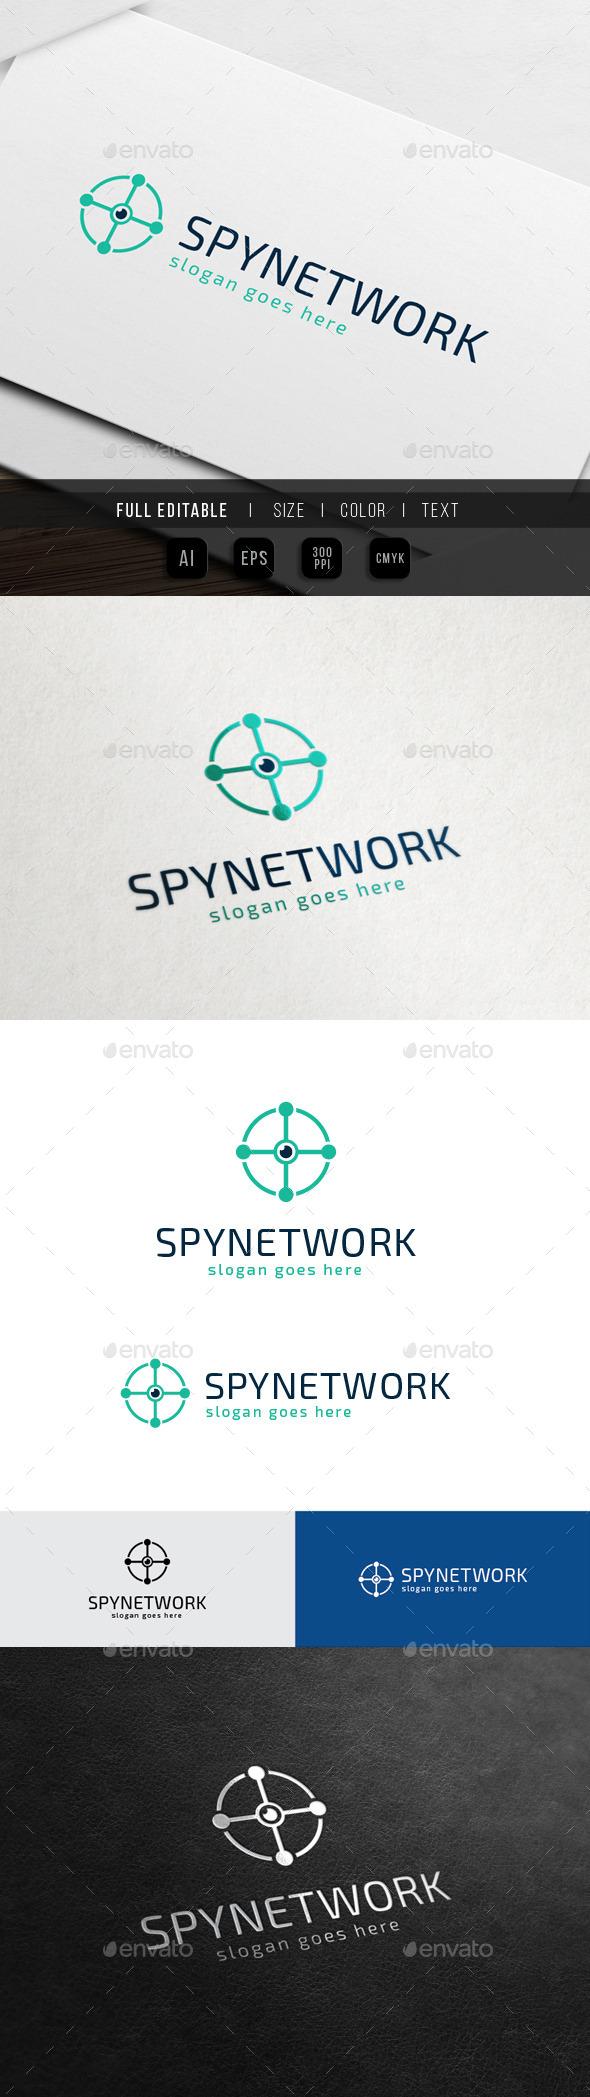 Circle Drone Camera - Spy Network - Objects Logo Templates